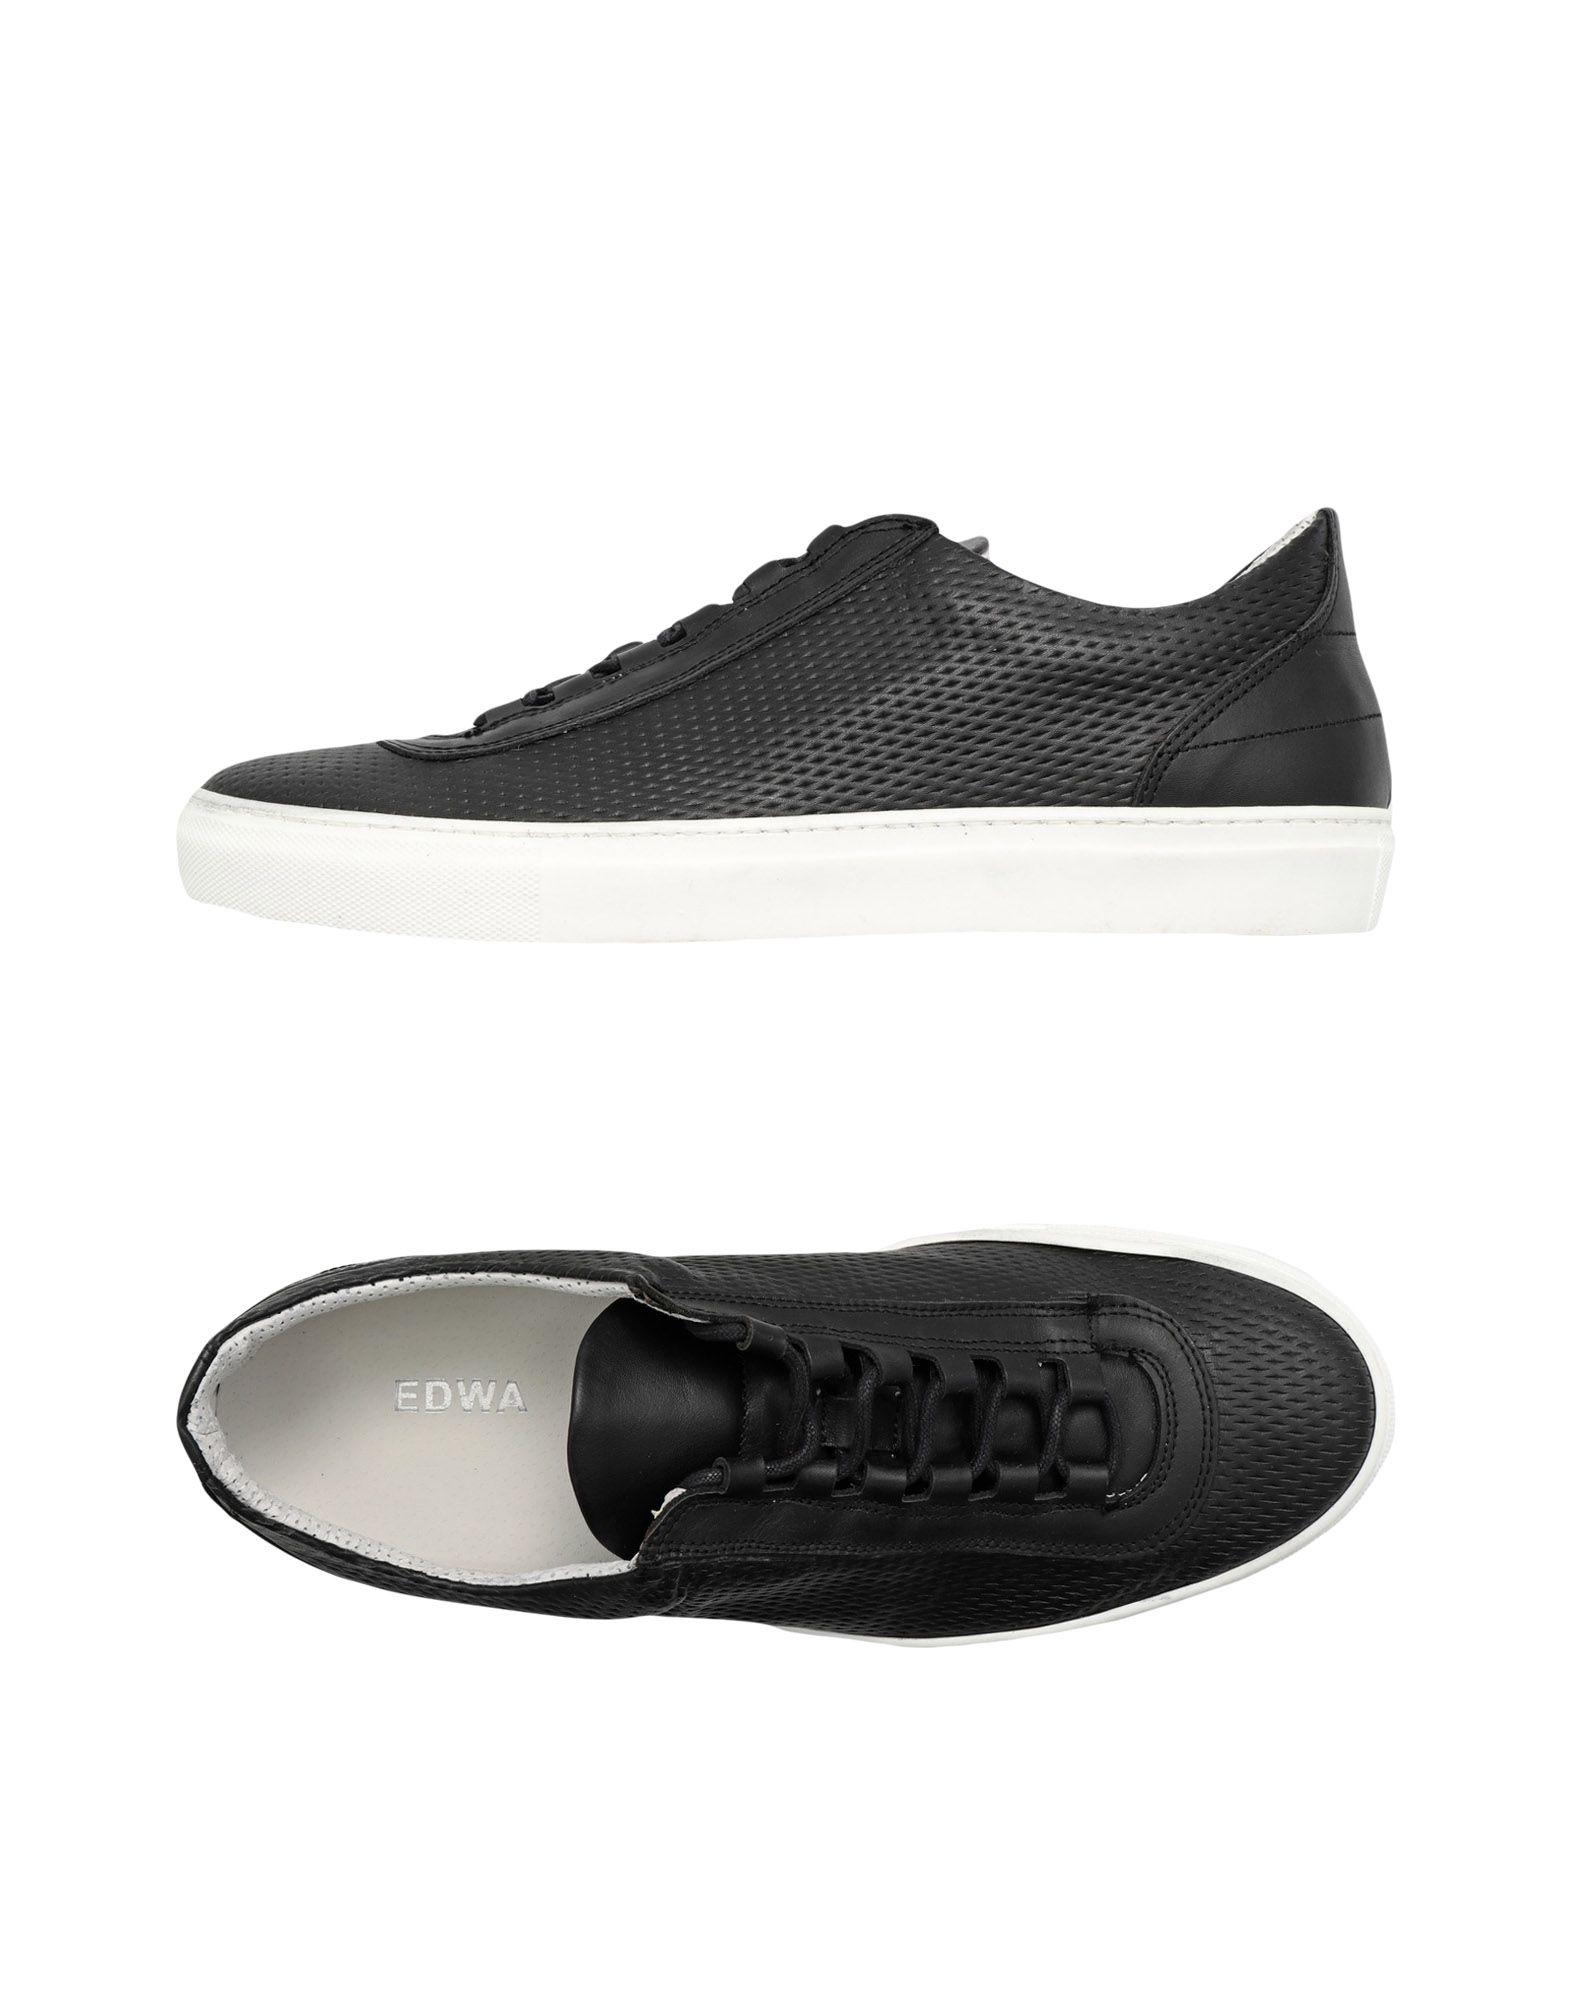 Haltbare Mode billige Schuhe Edwa Sneakers Herren  11458292TK Heiße Schuhe